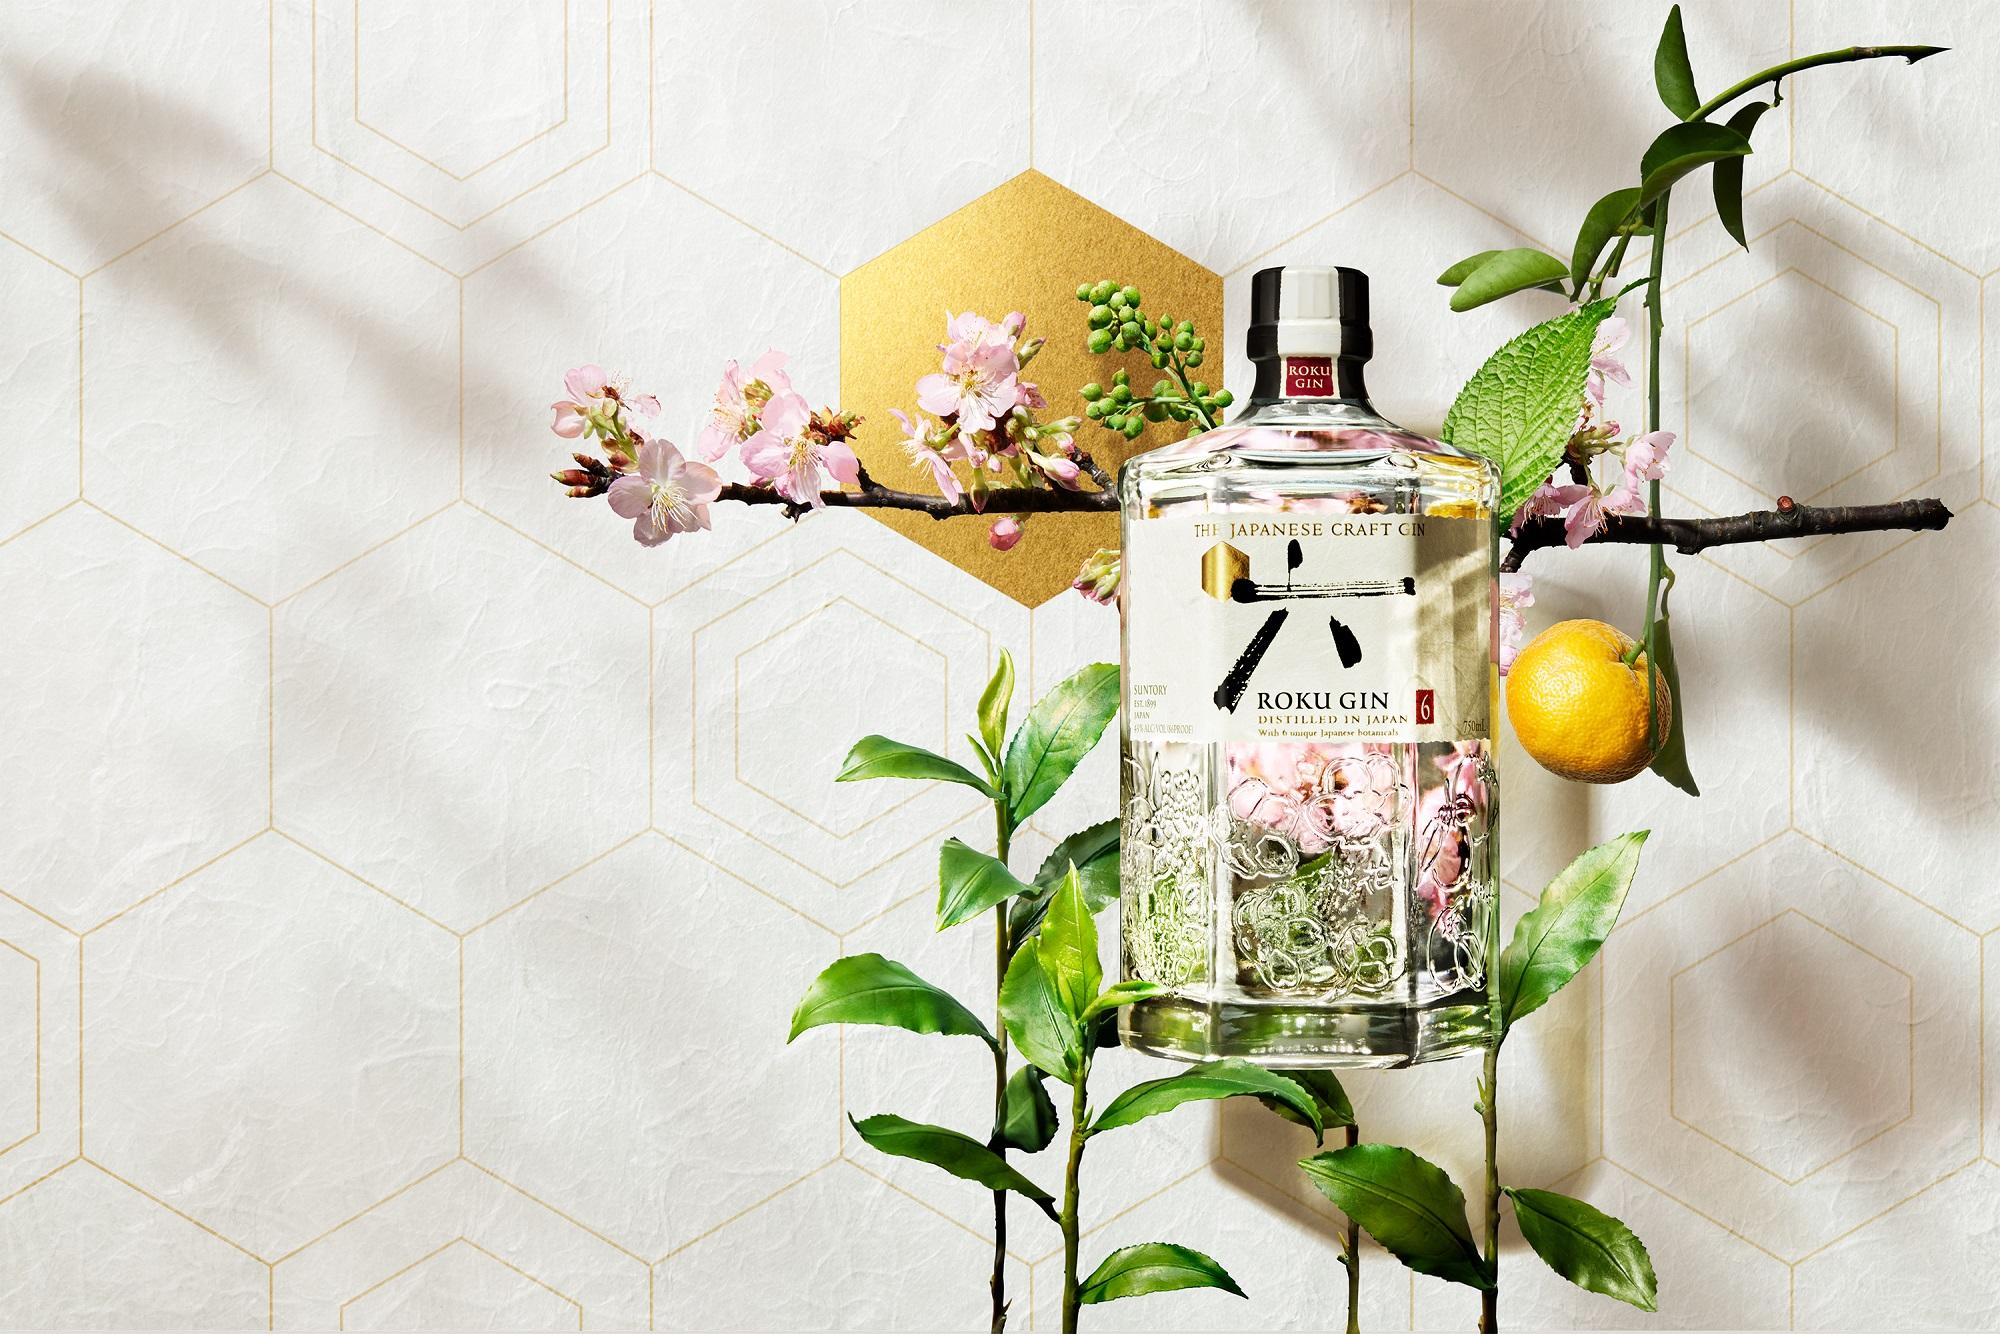 Roku Gin botaniche